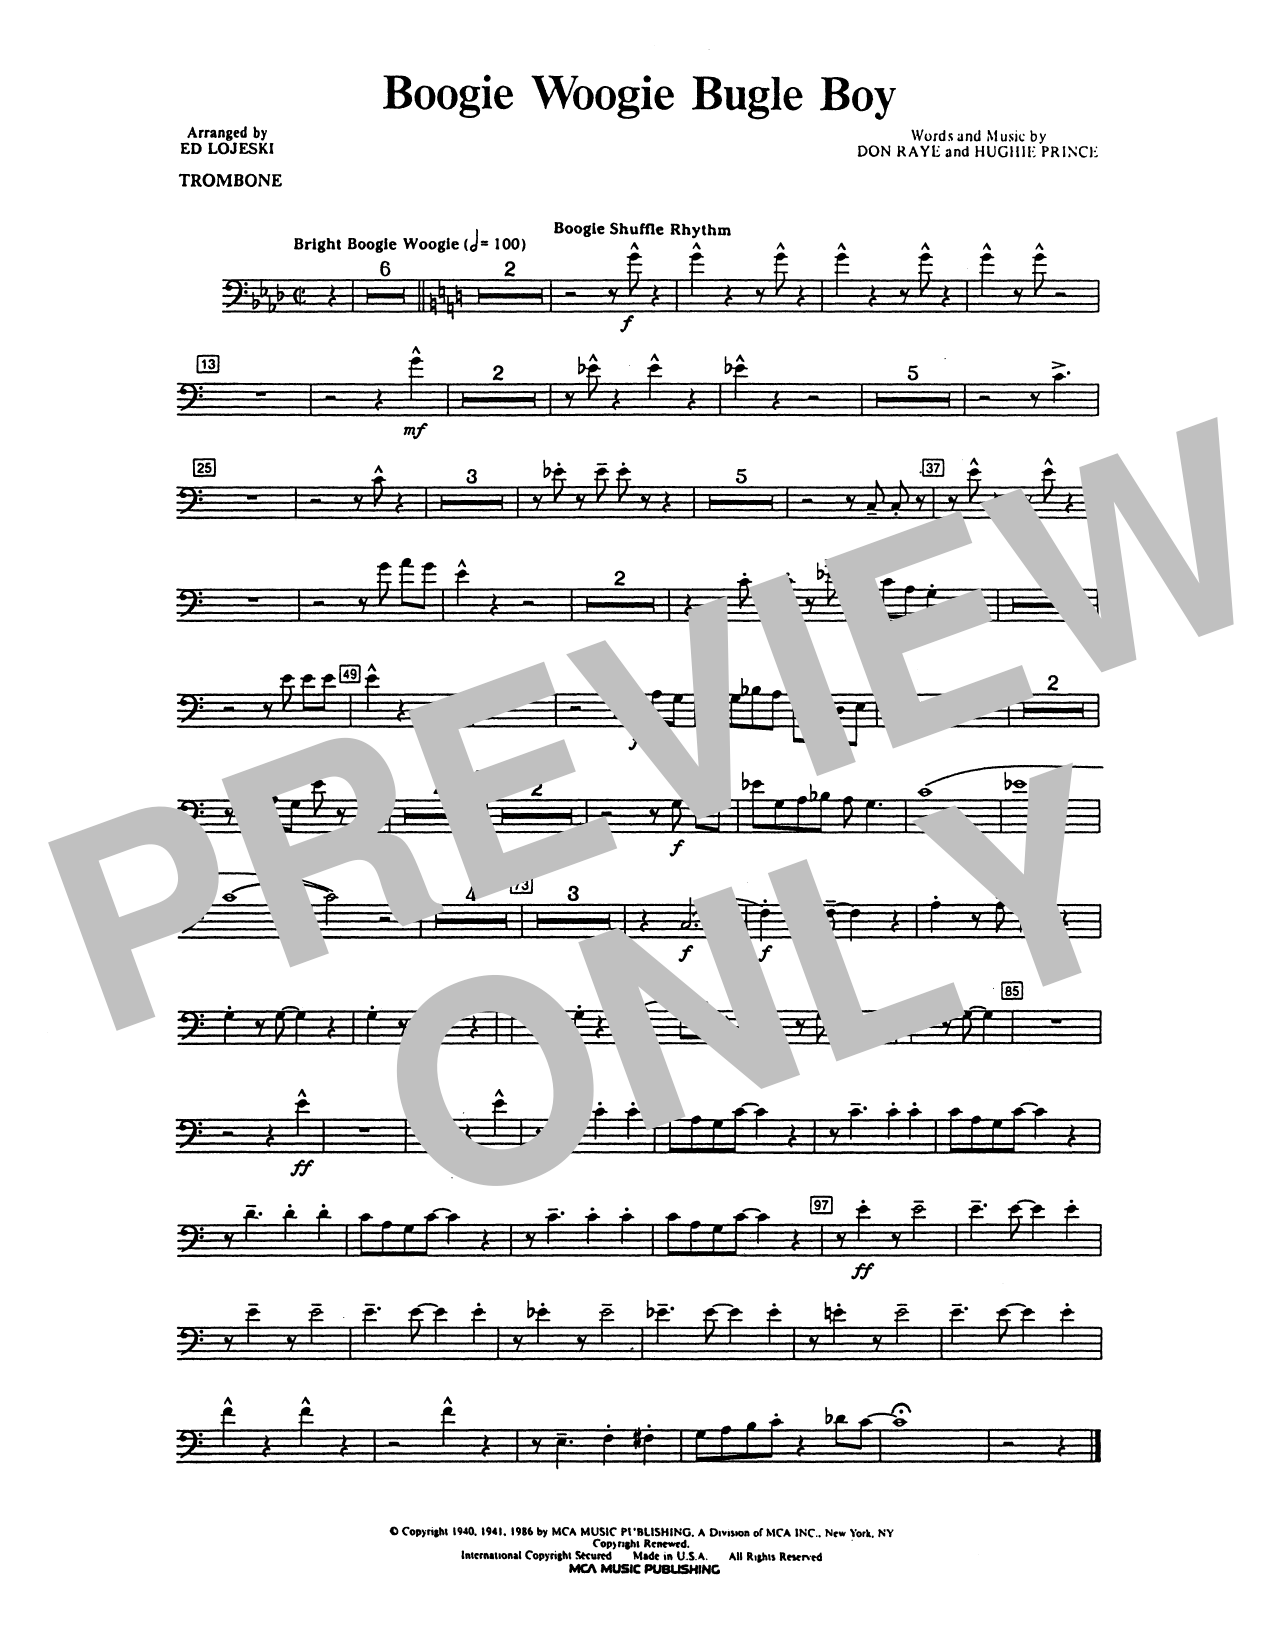 Boogie Woogie Bugle Boy - Trombone Sheet Music